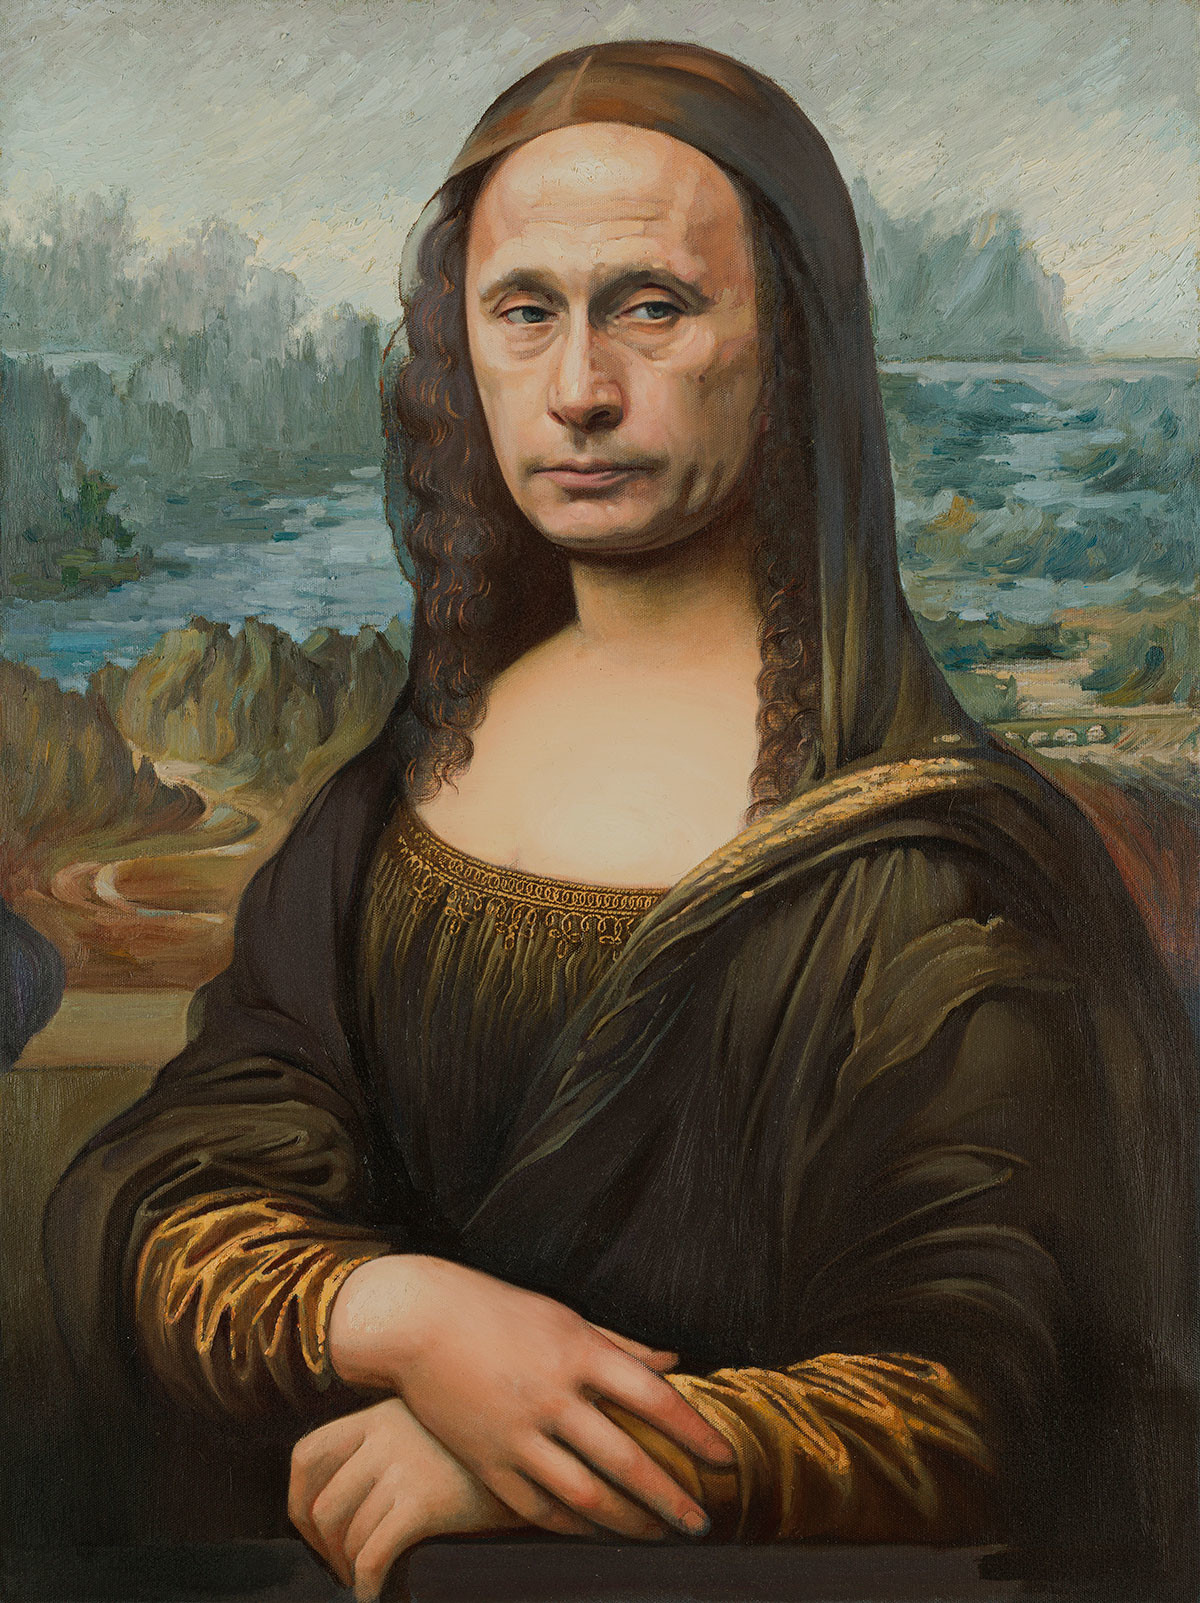 Alexander Kosolapov. Mona Lisa, 2020.